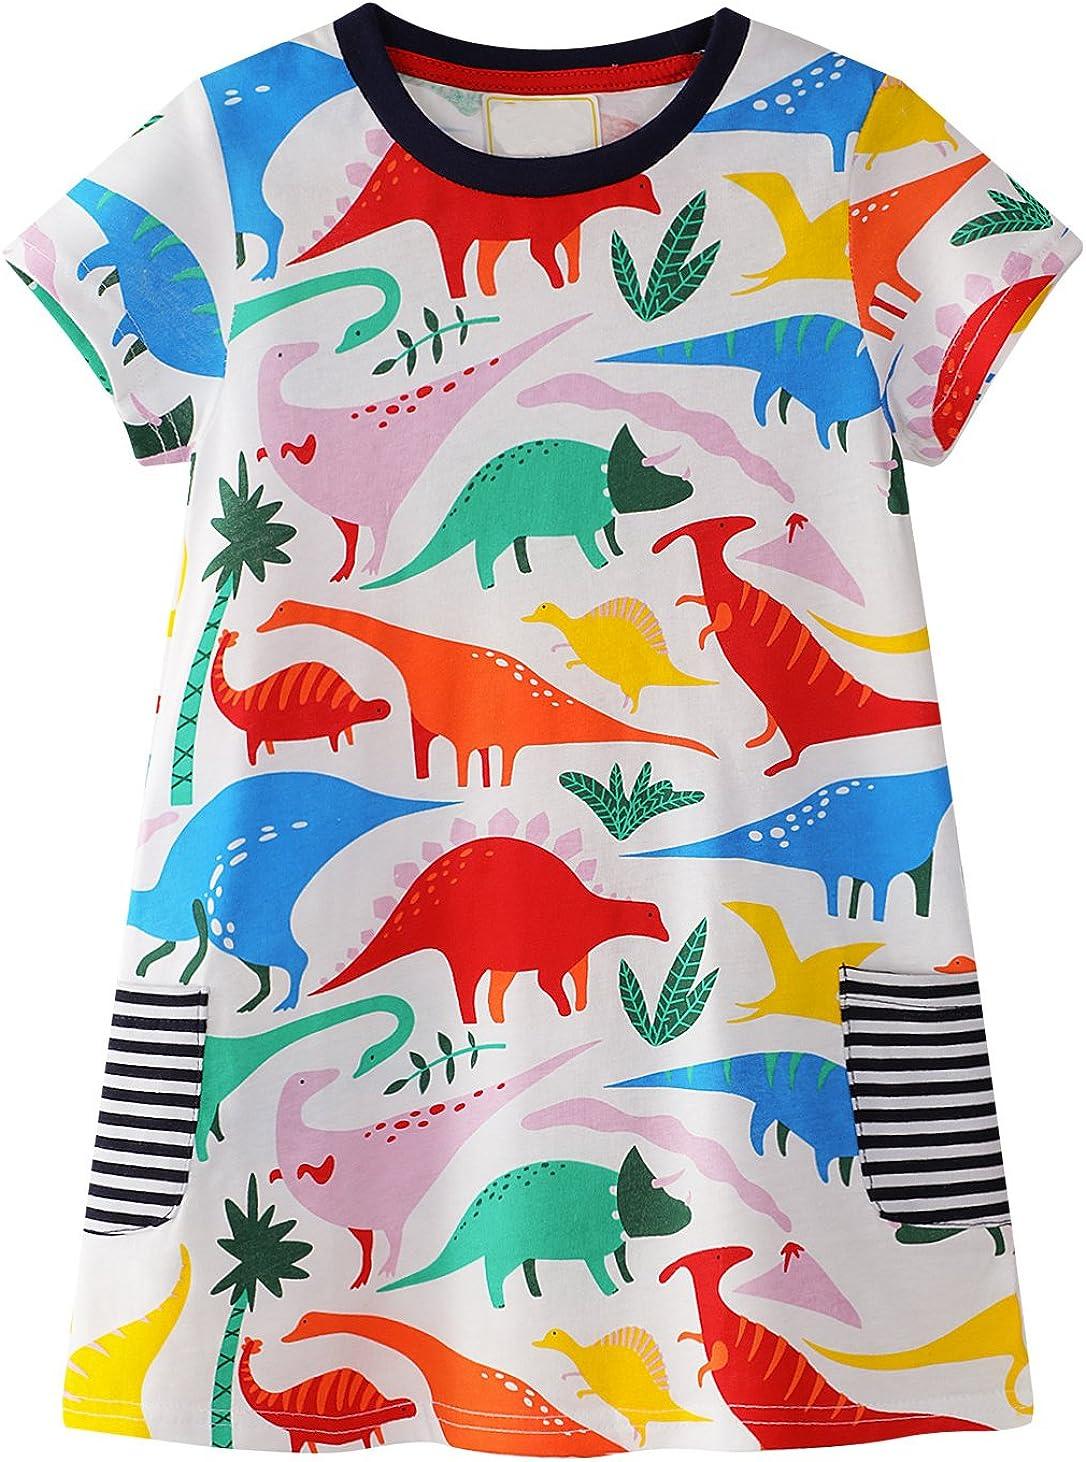 GSVIBK Kid Girls Cotton Dresses Girl Long Sleeve Cartoon Dress Baby Cute Dresses Toddler Dinosaur Dress